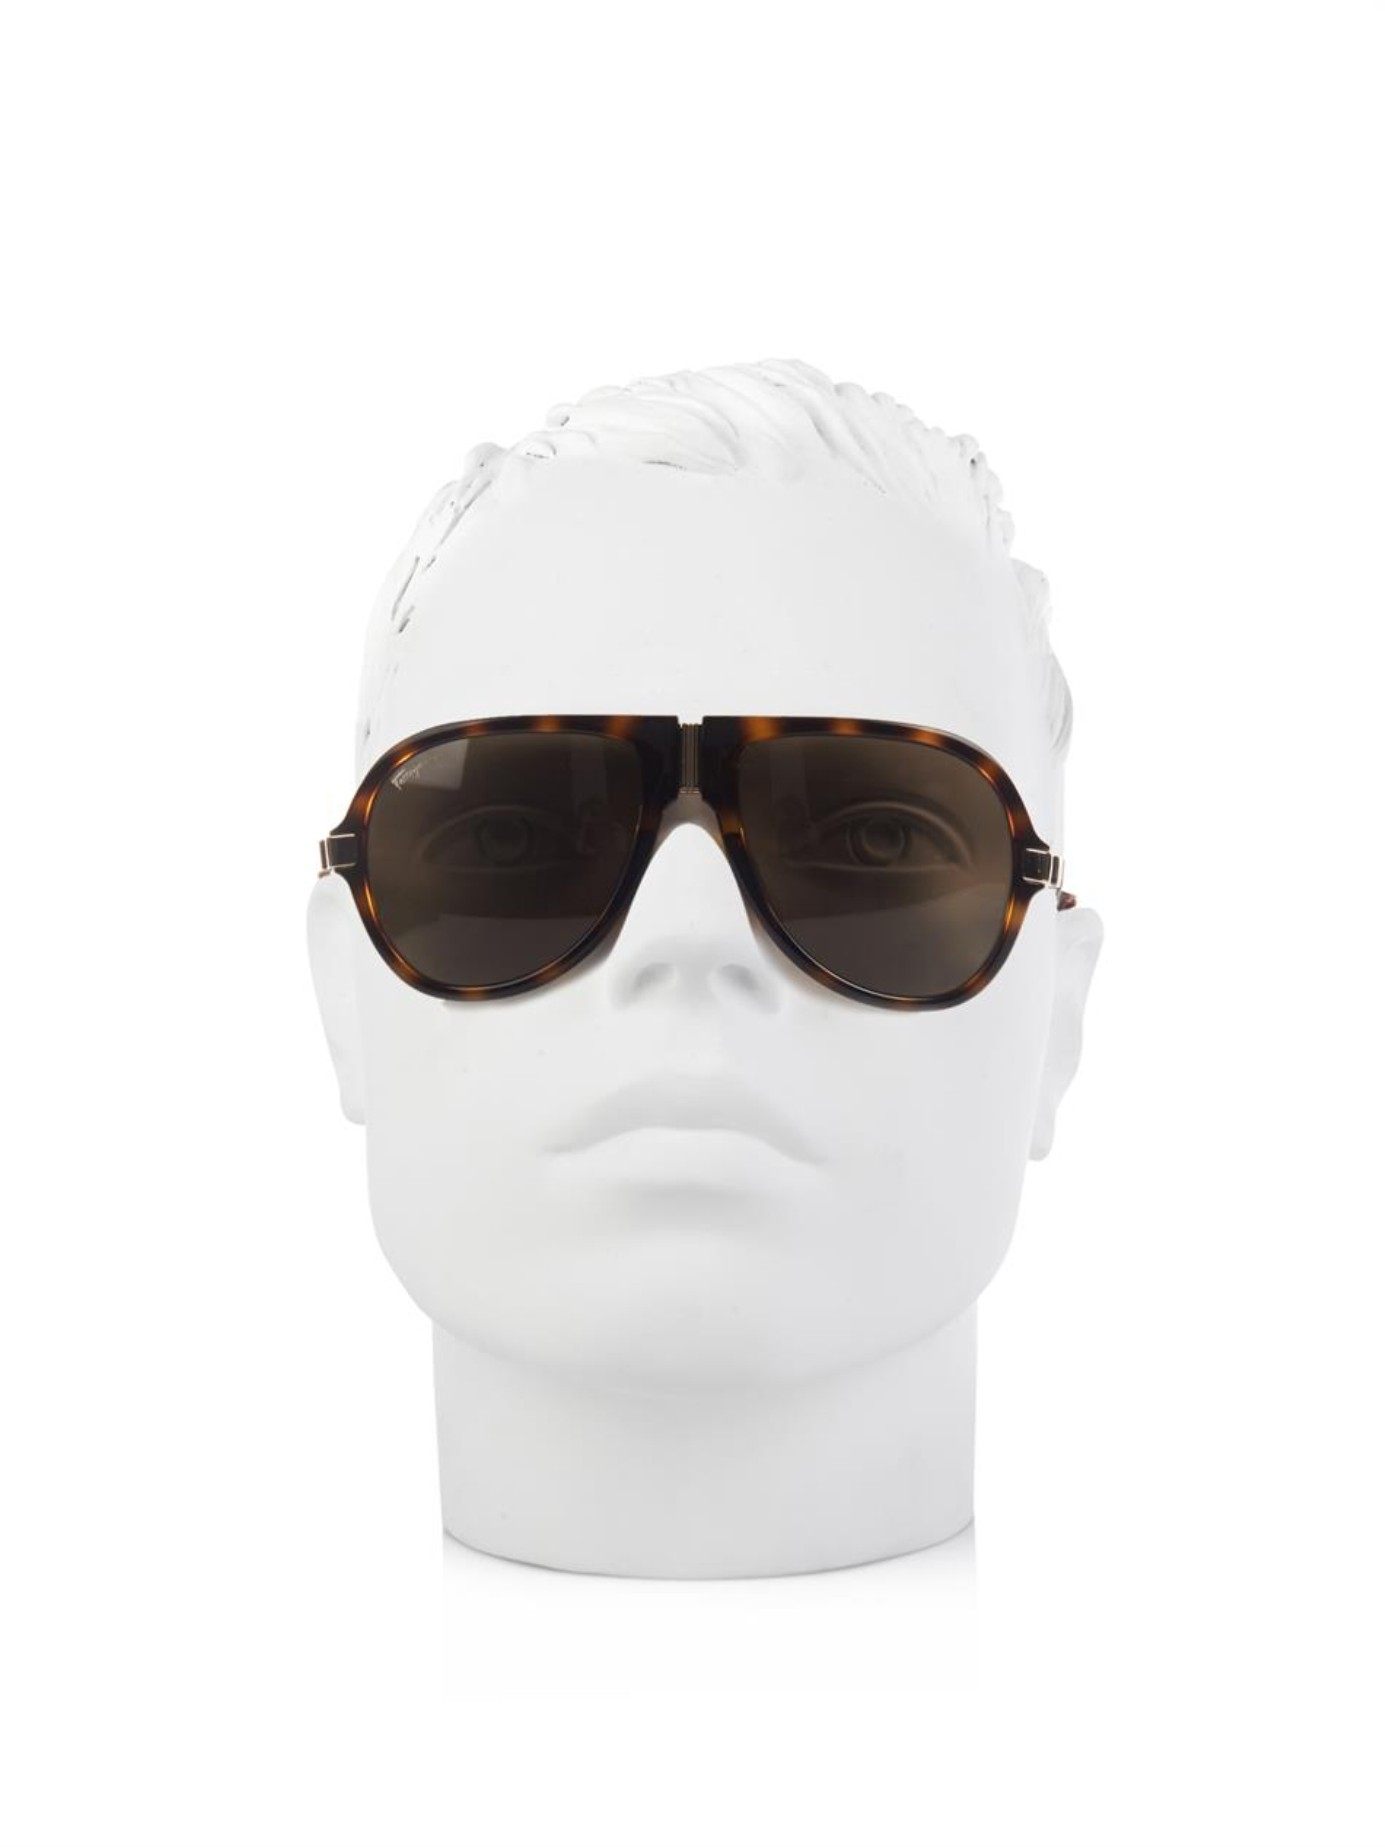 Ferragamo Folding Aviator-Style Sunglasses in Brown for Men